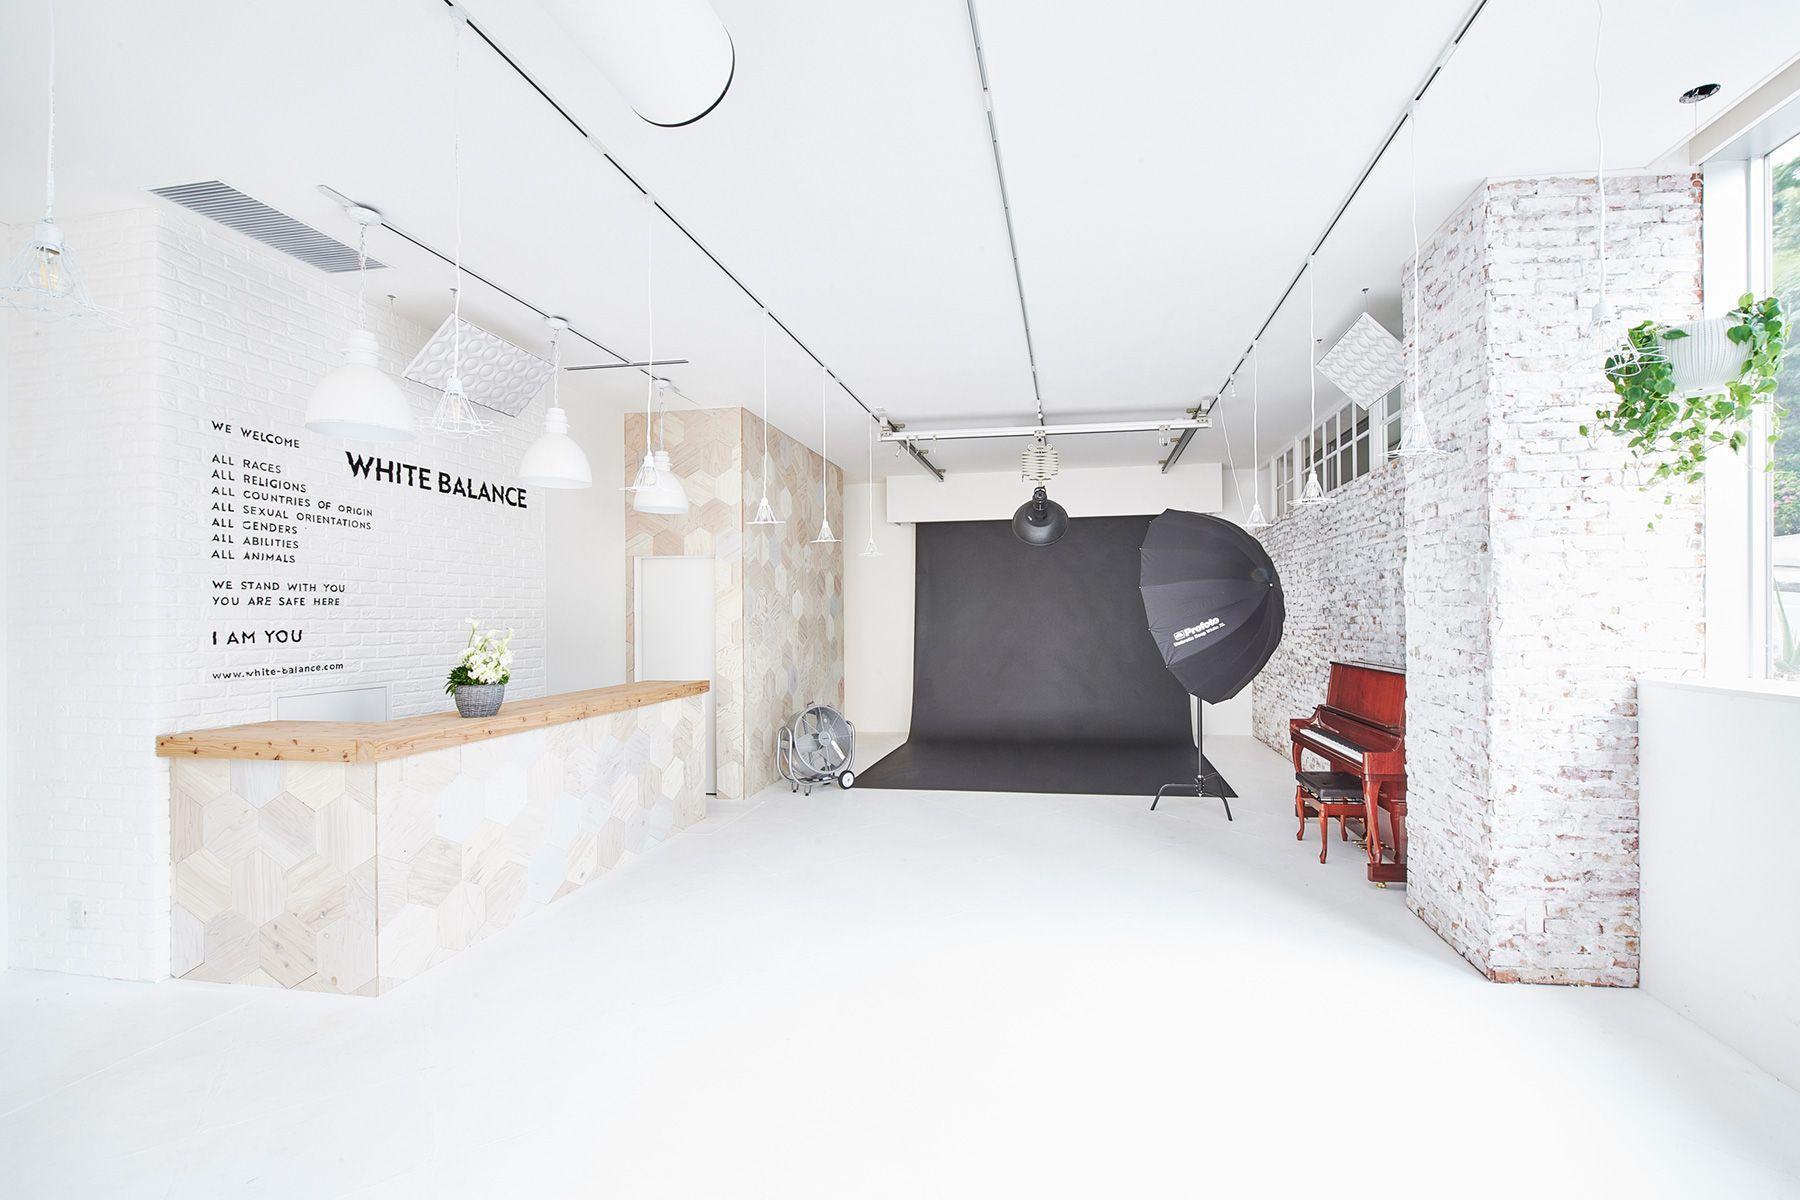 WHITE BALANCE (ホワイトバランス)窓も大きく気持ちいい空間